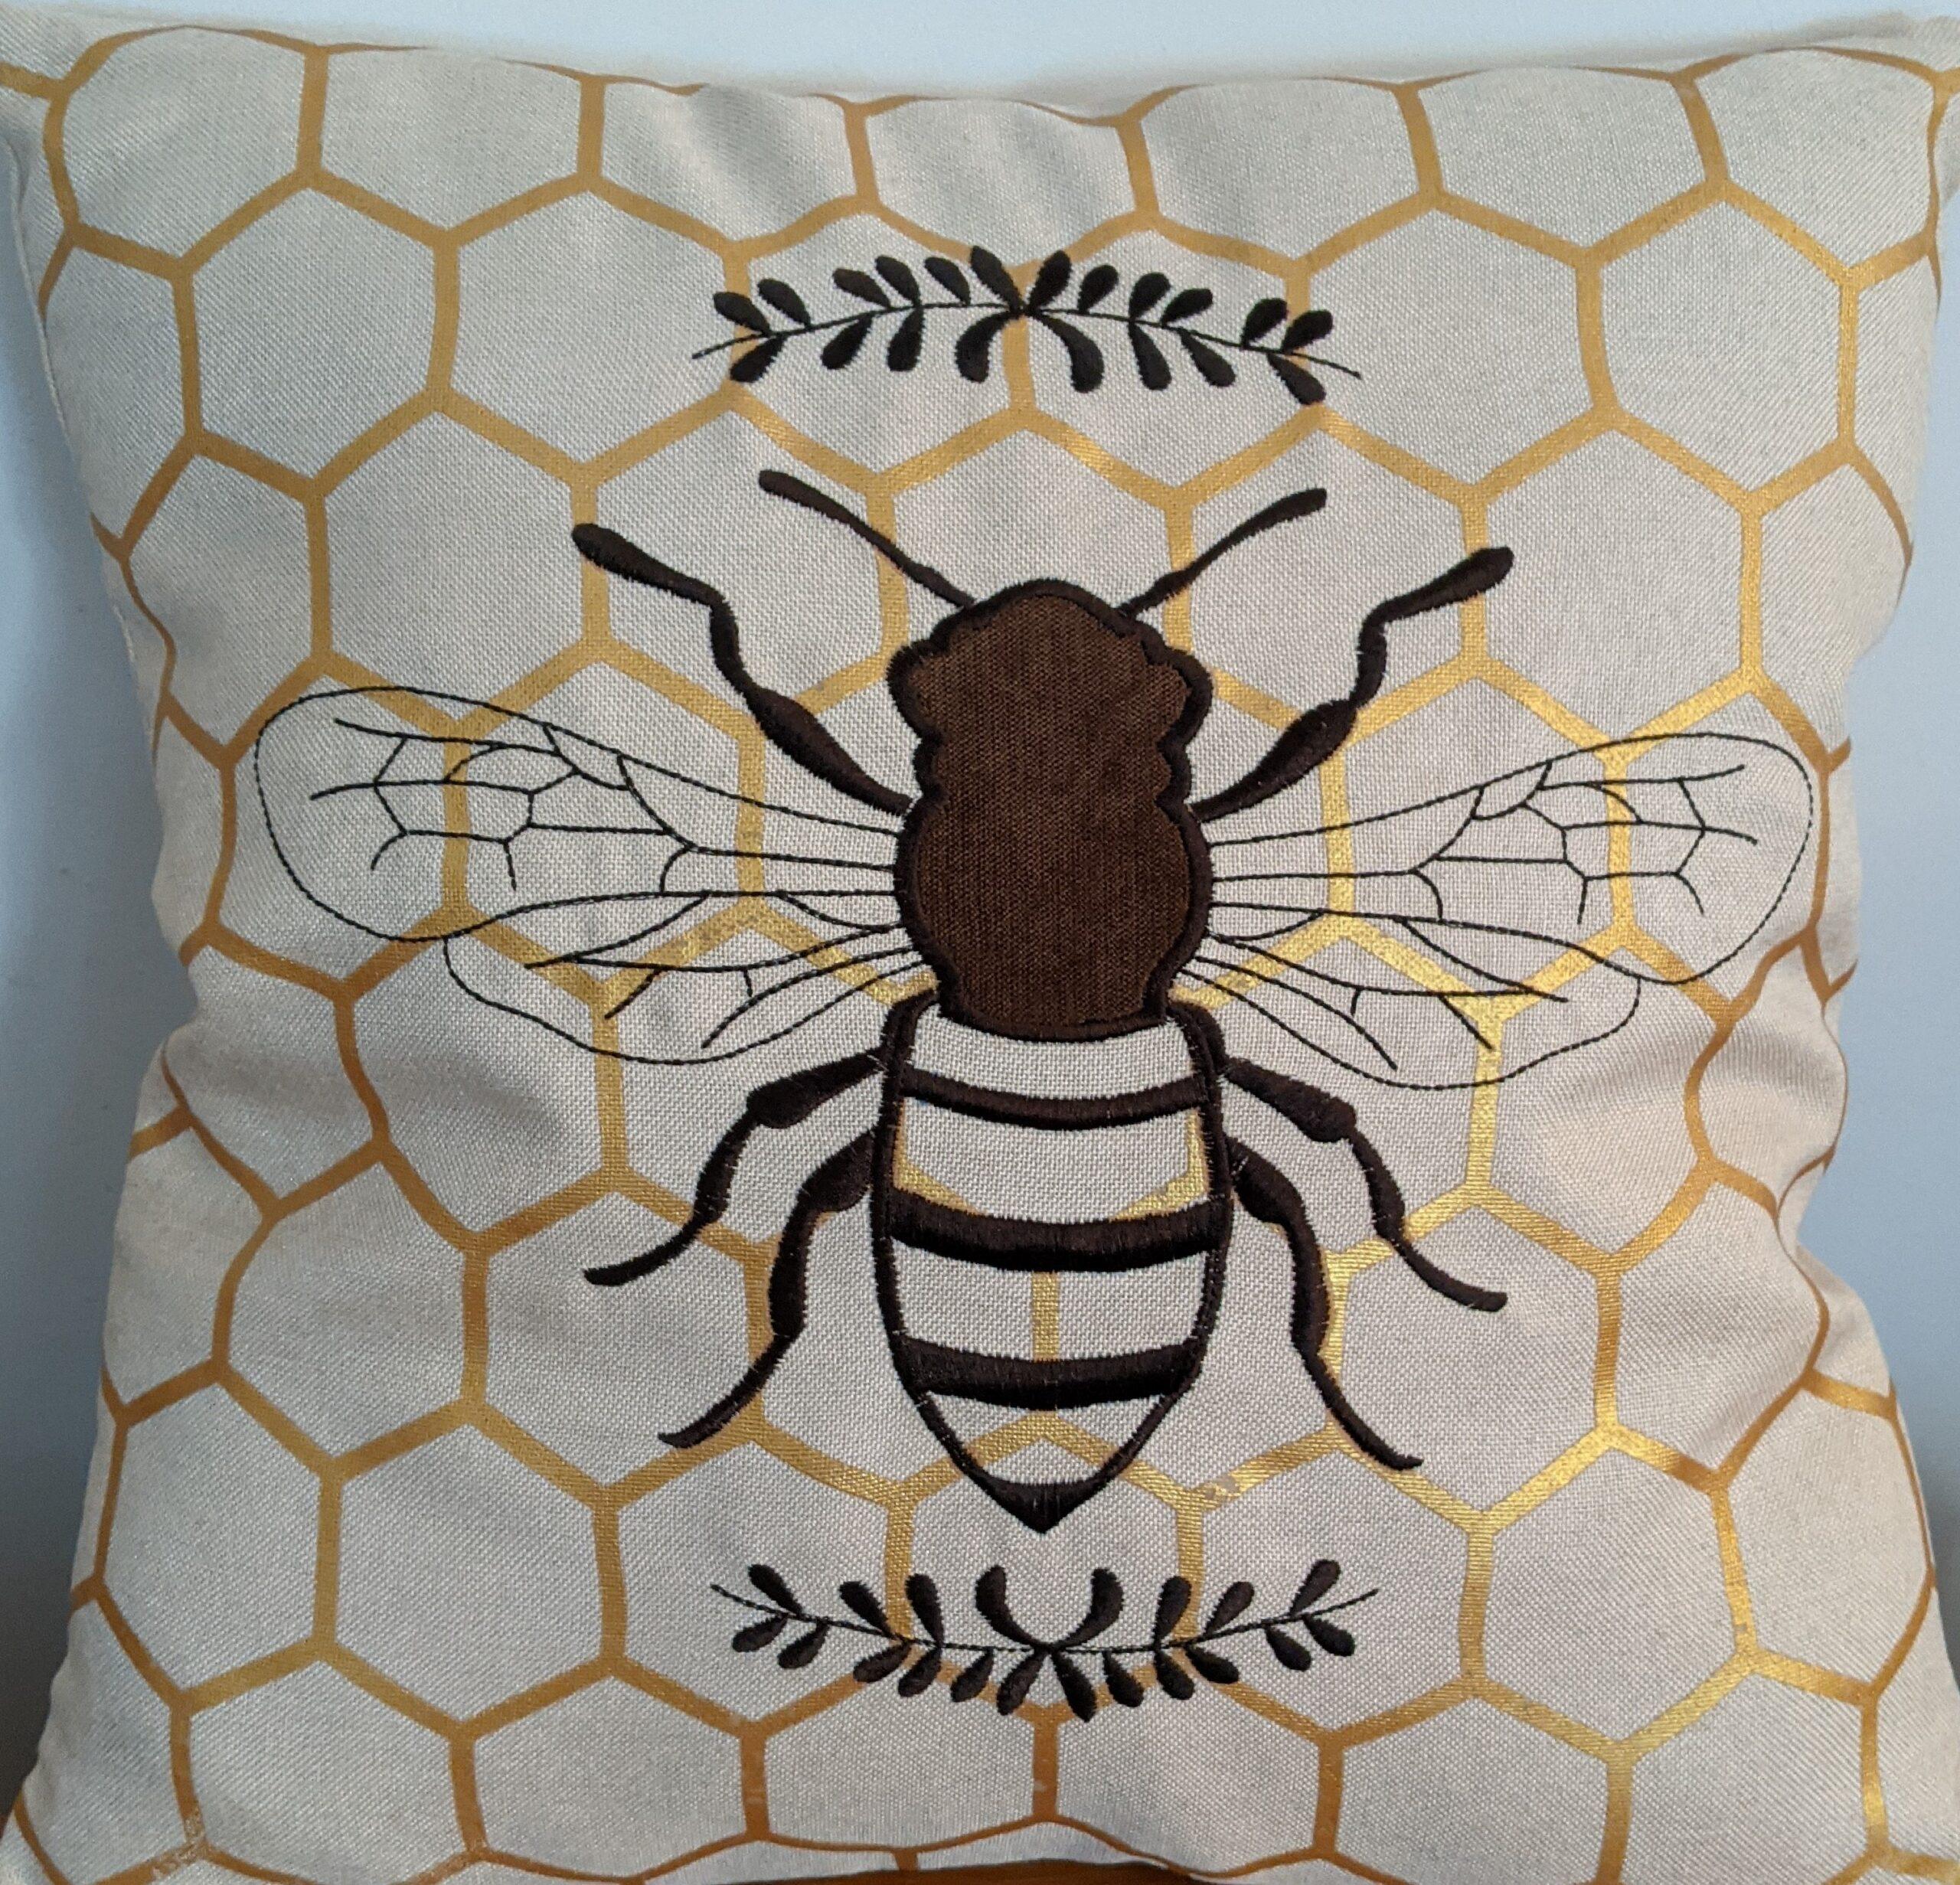 Cutest Bee Pillow Ever